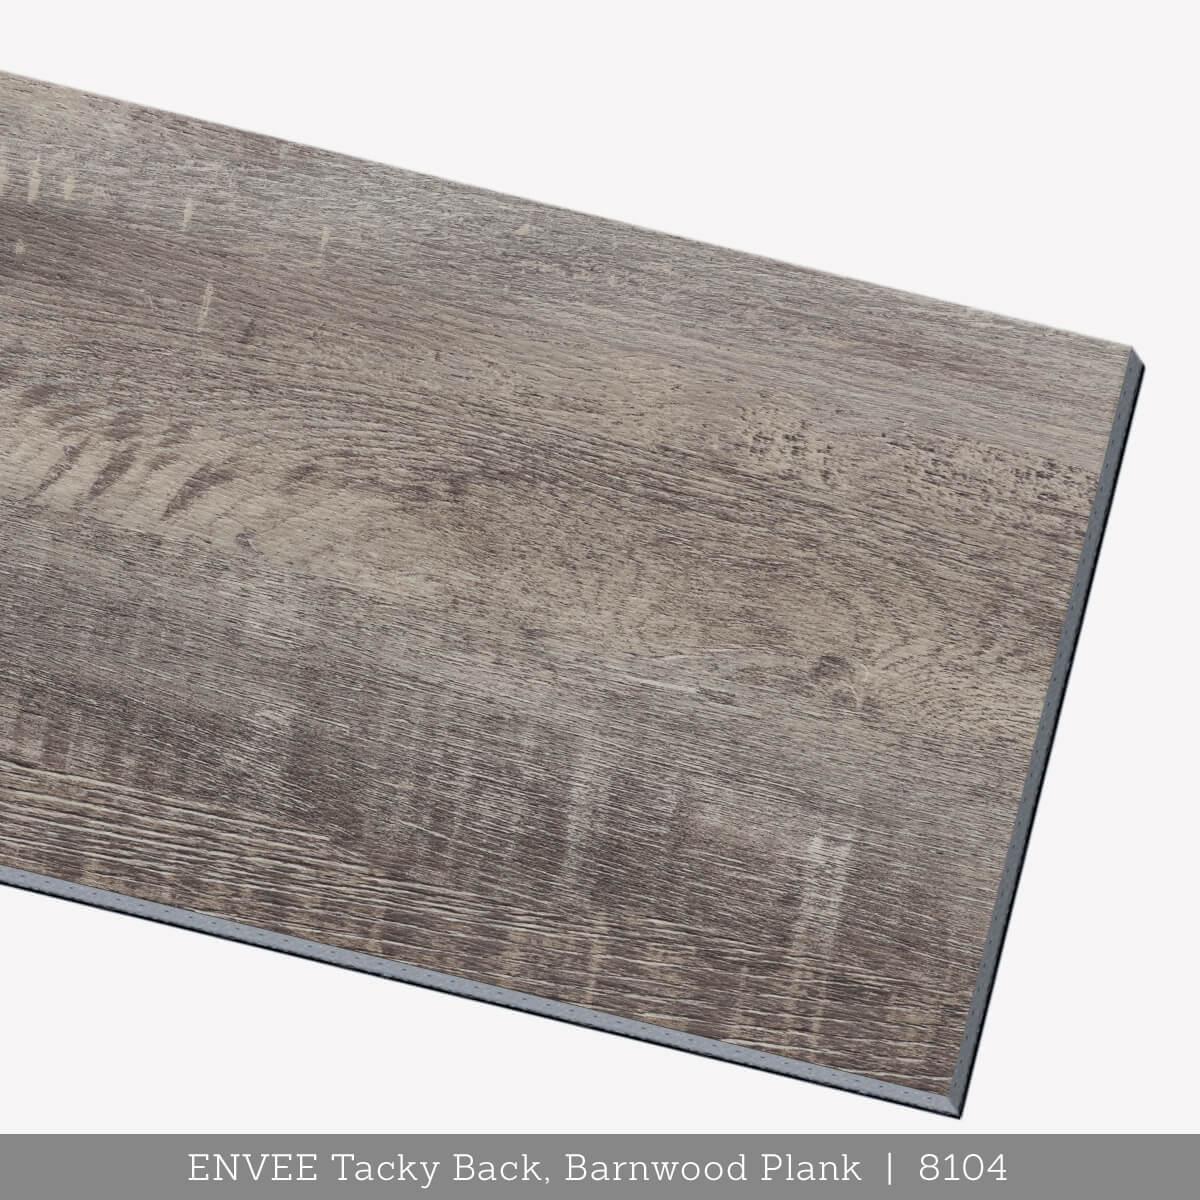 Envee Tacky Back, Barnwood Plank